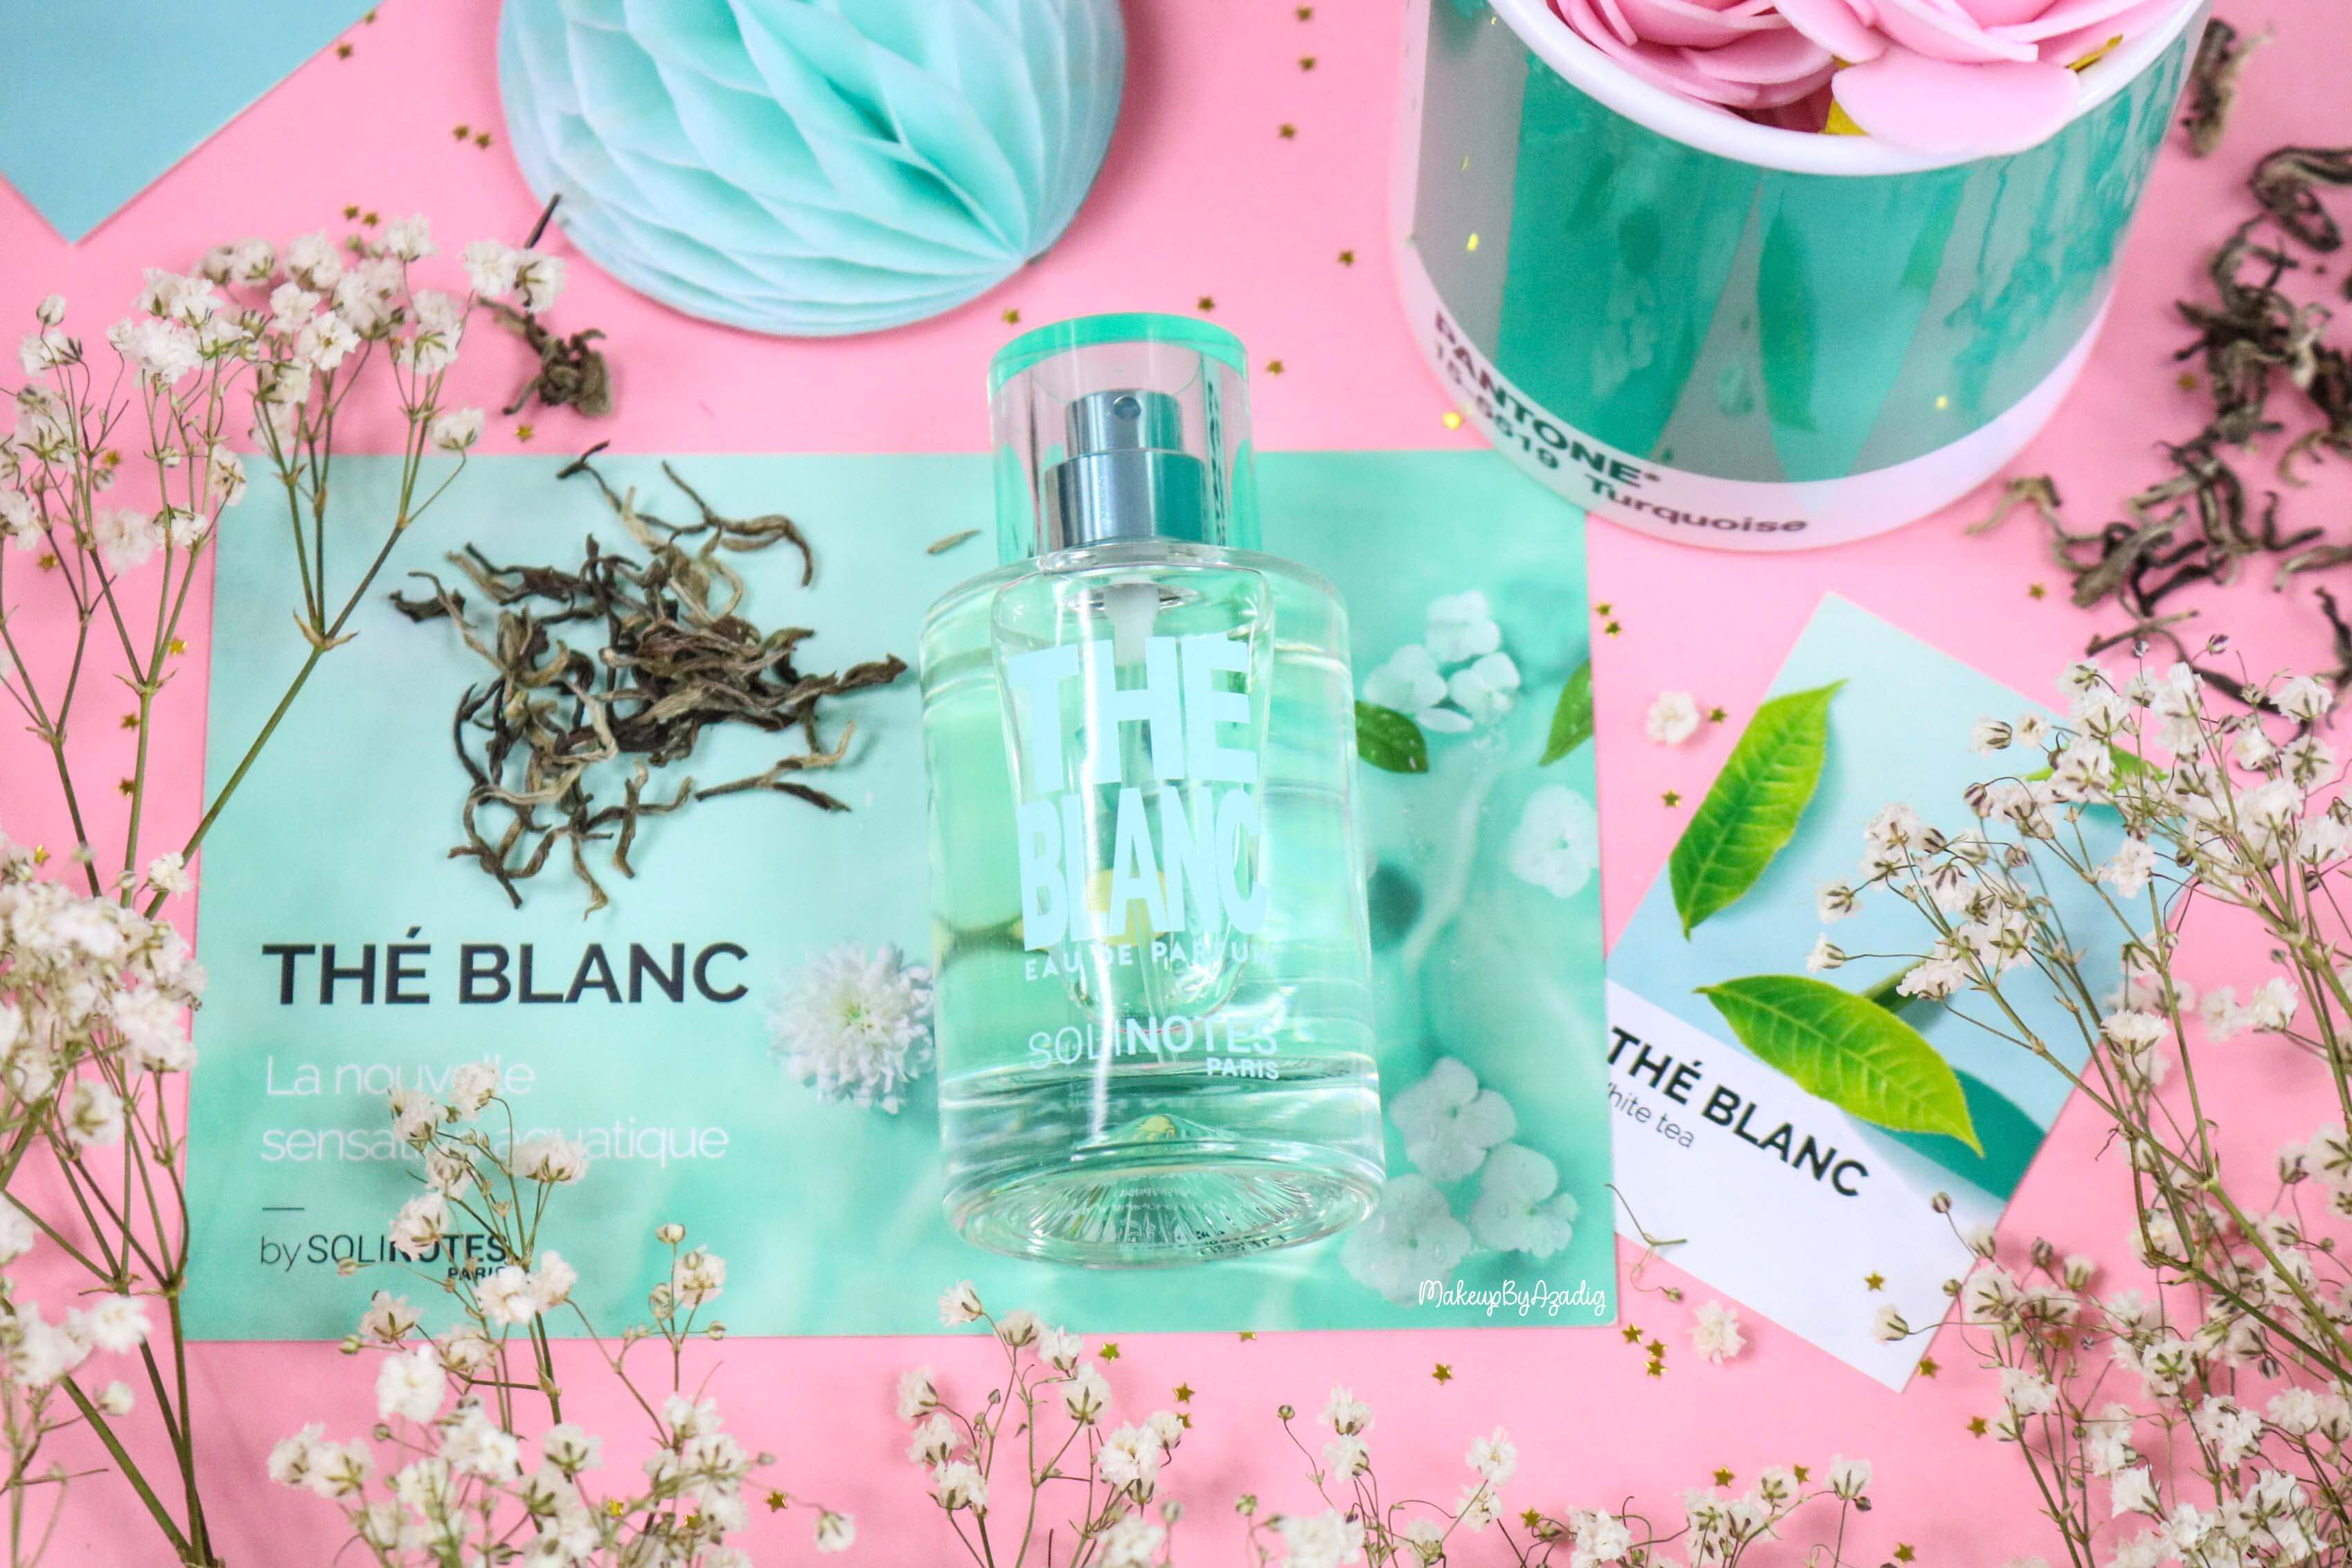 revue-parfum-solinotes-sephora-monoprix-the-blanc-vanille-oranger-prix-pas-cher-promo-makeupbyazadig-mint